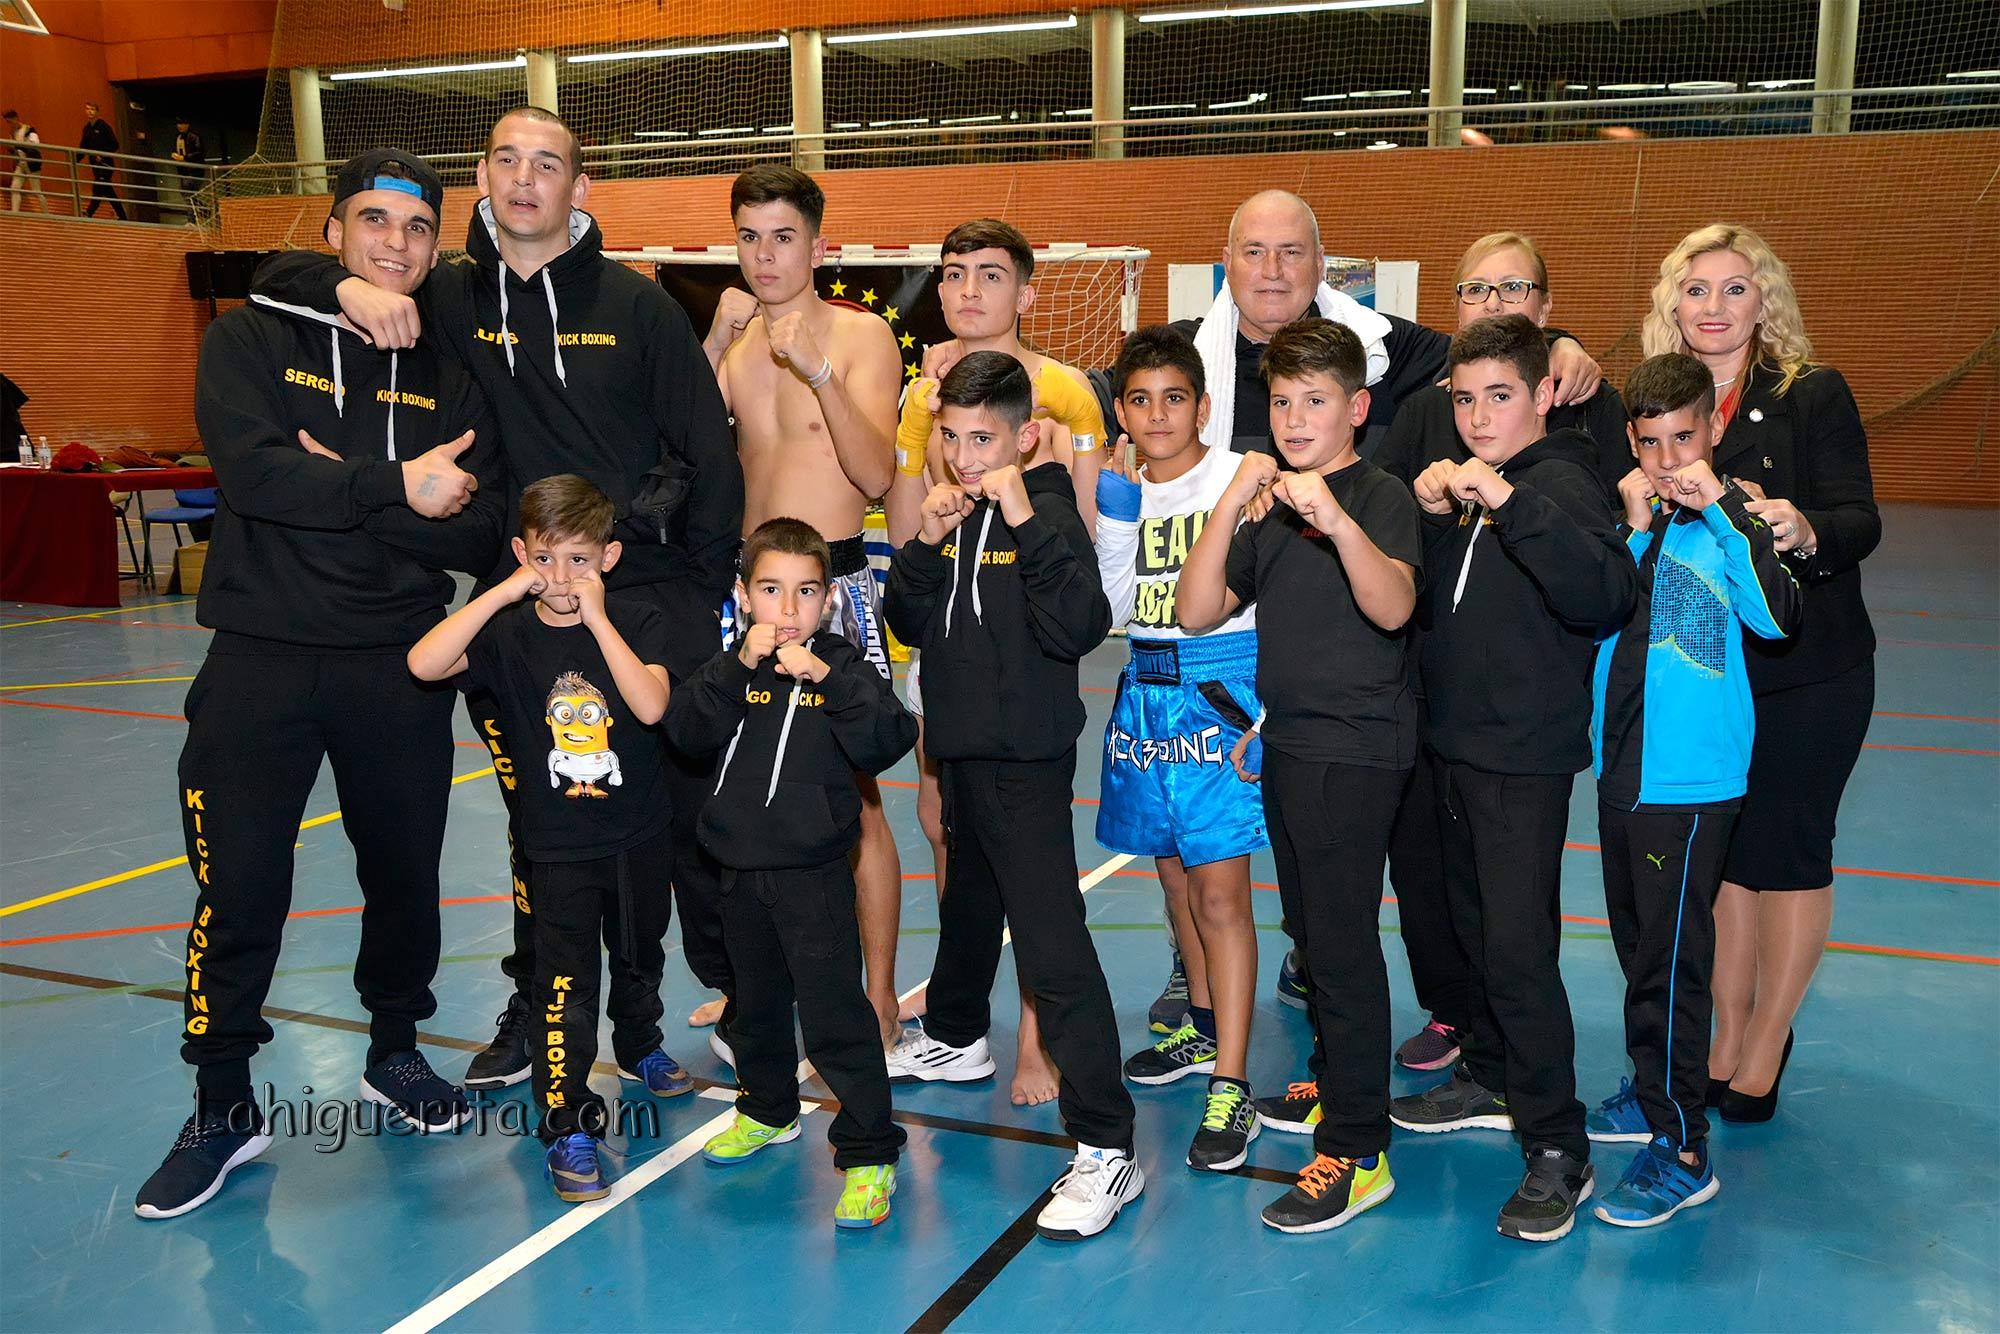 Fotografías del I Campeonato Kickboxing Isla Cristina